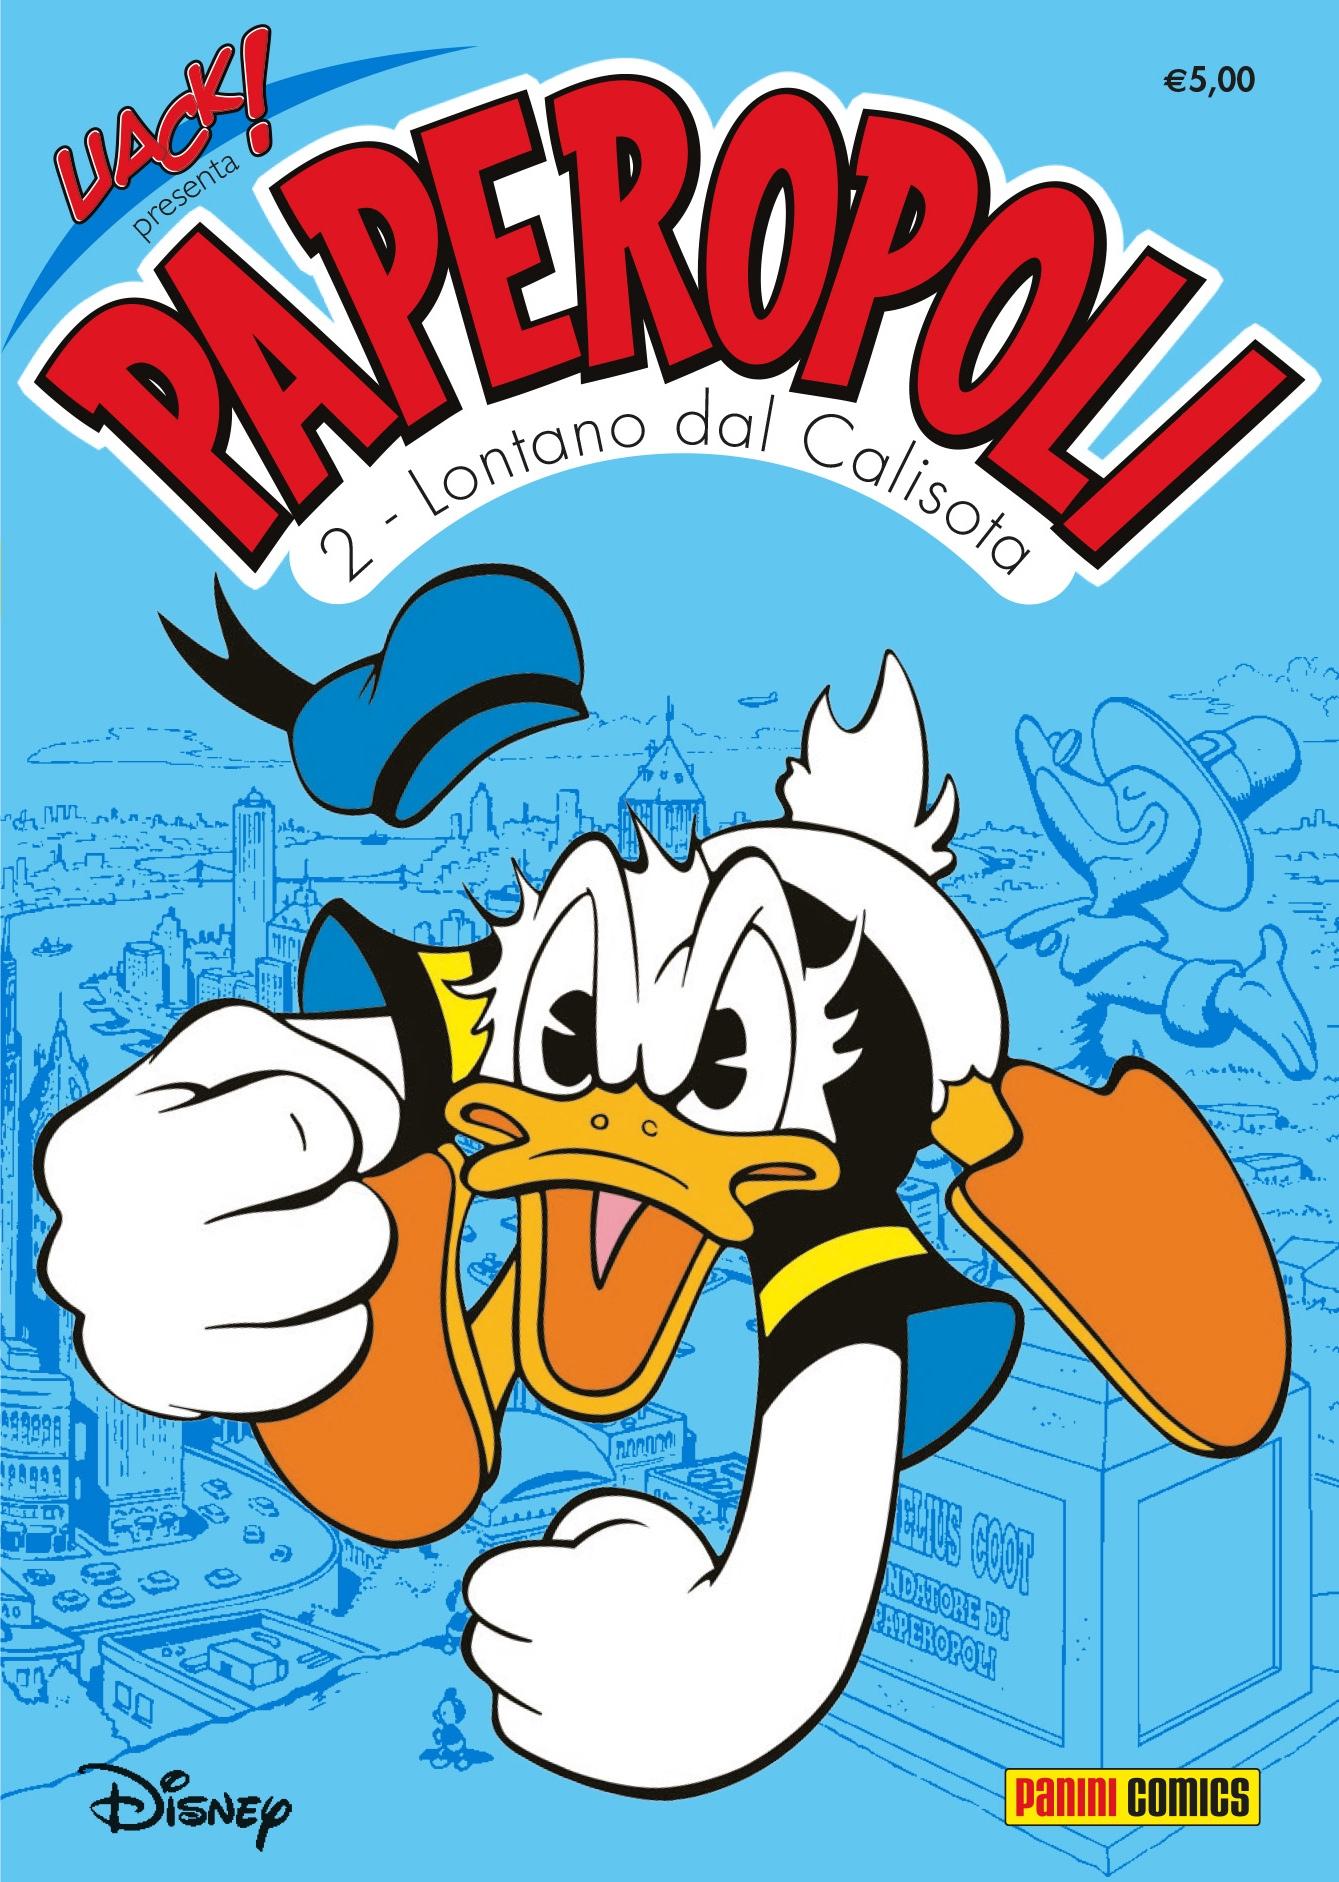 Cover Uack! 25 - Paperopoli 2 - Lontano dal Calisota